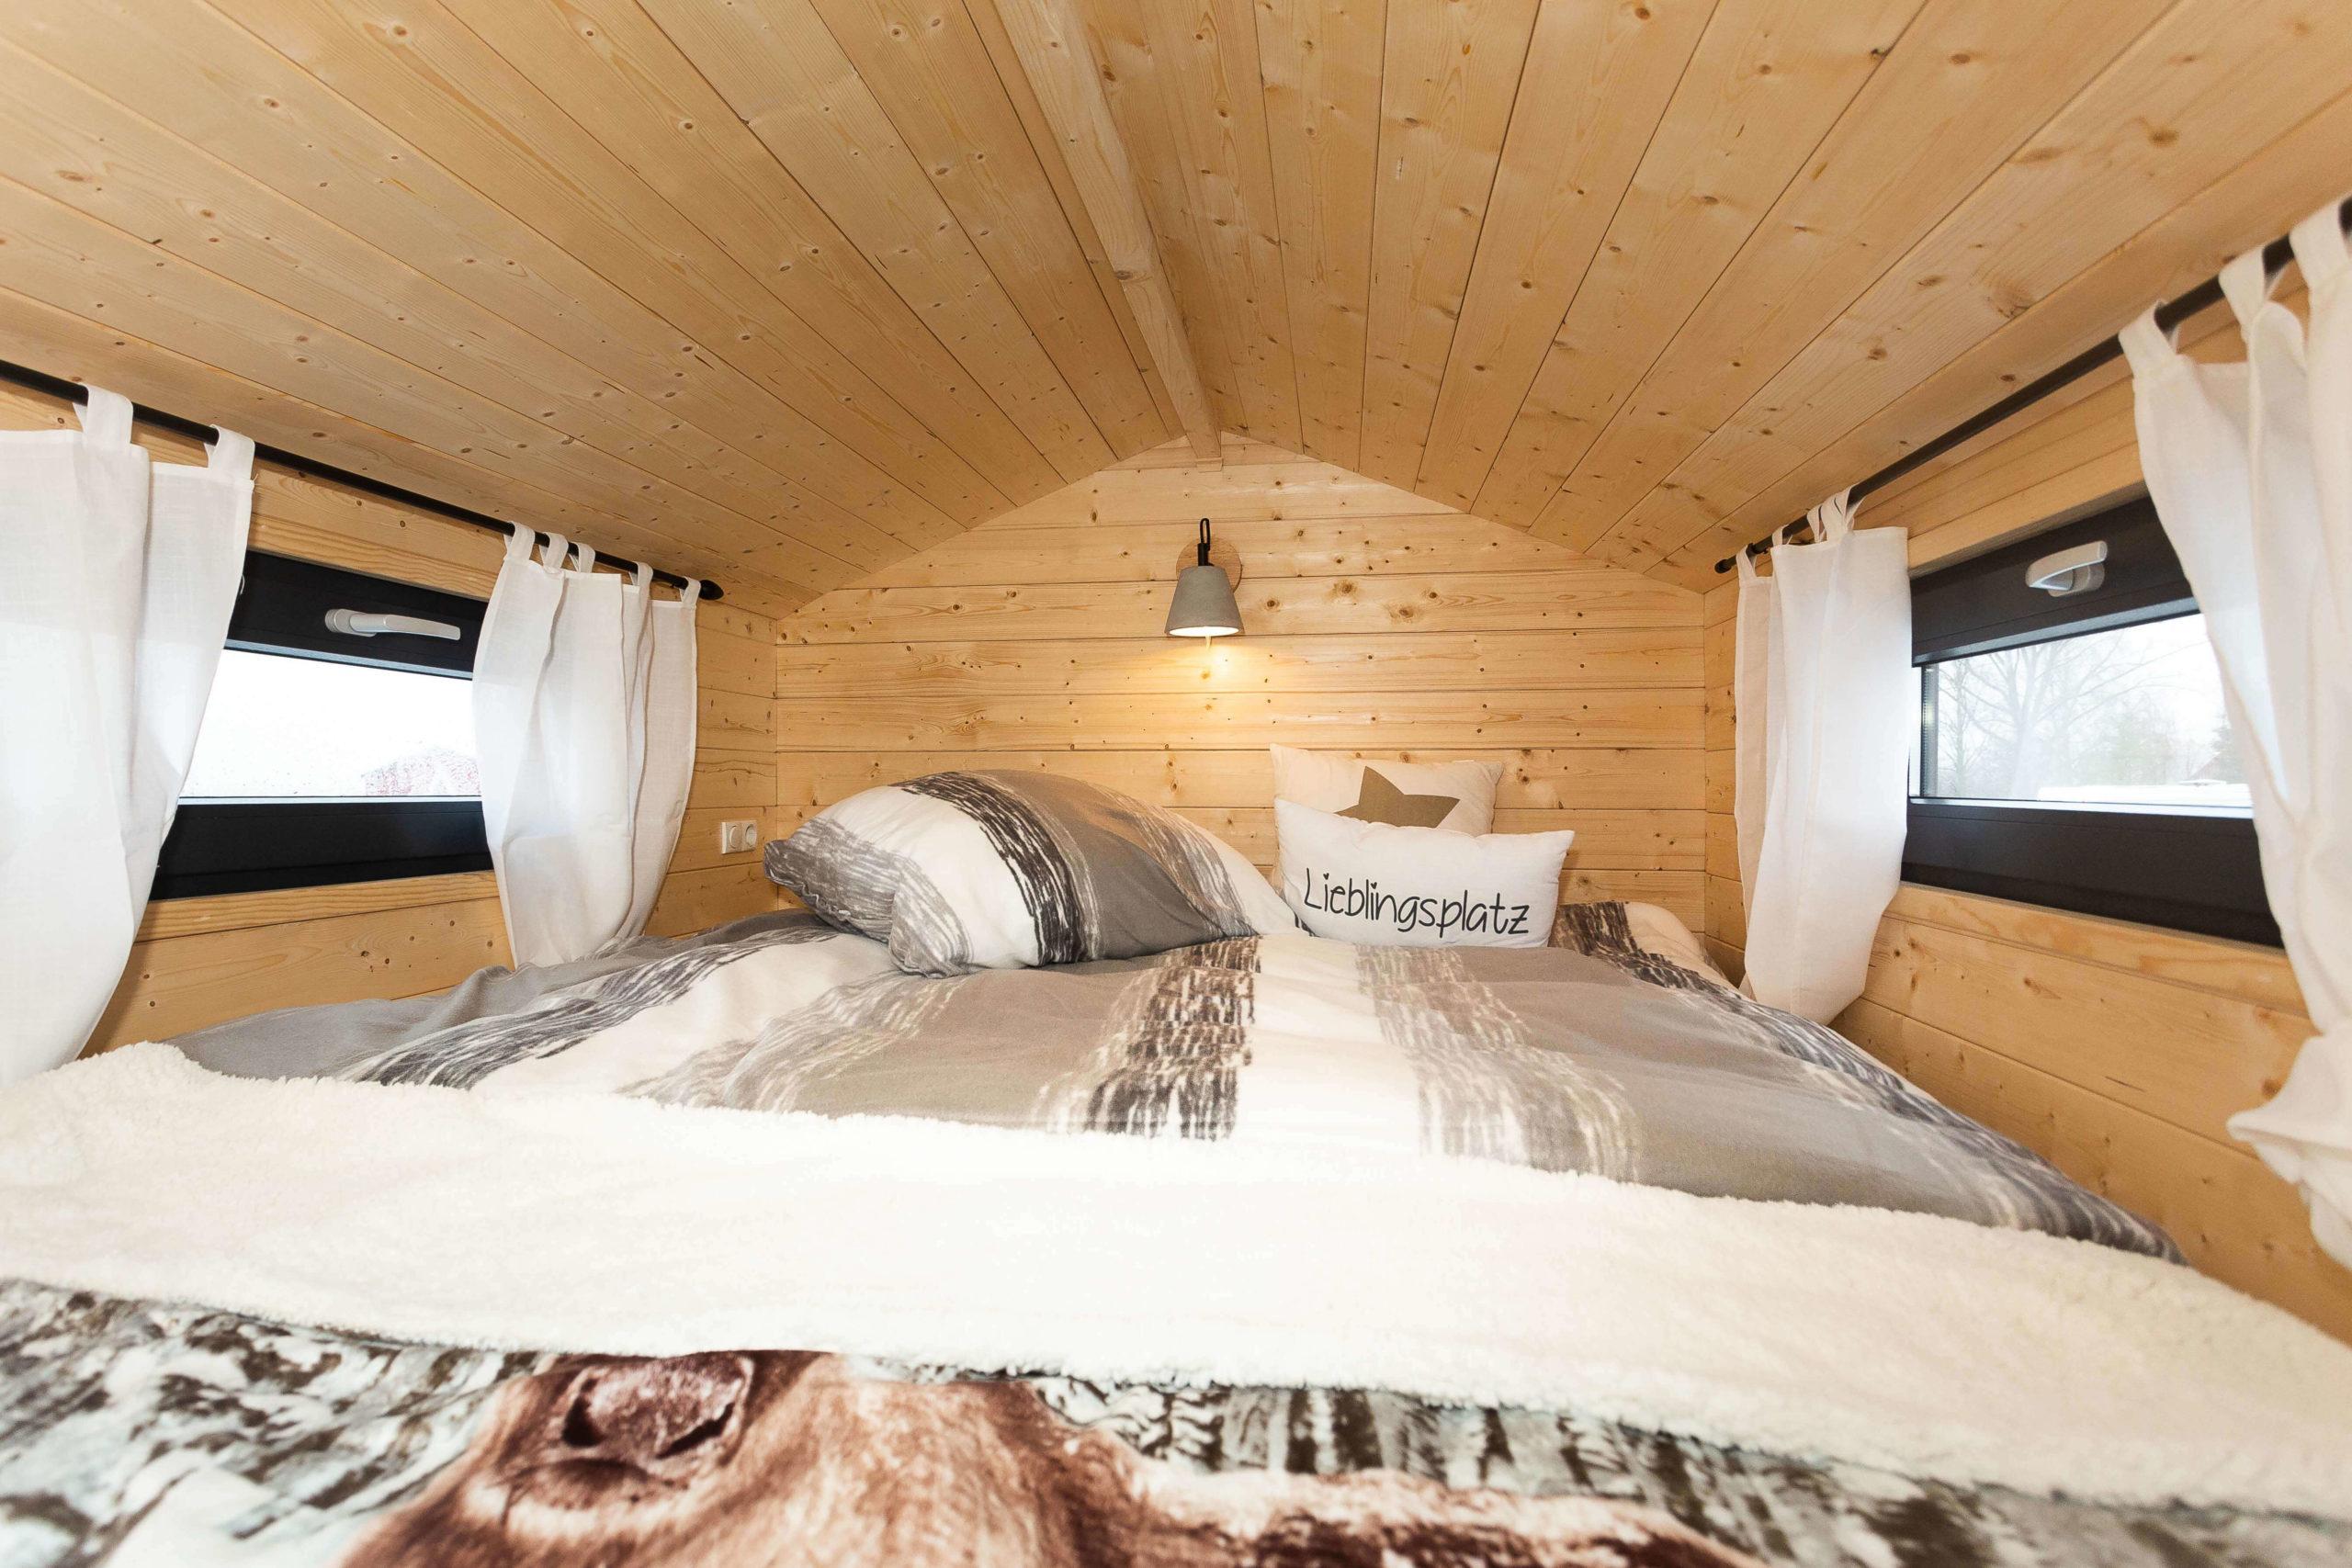 mobiles-tiny-house-australien-vital-camp-gmbh-20